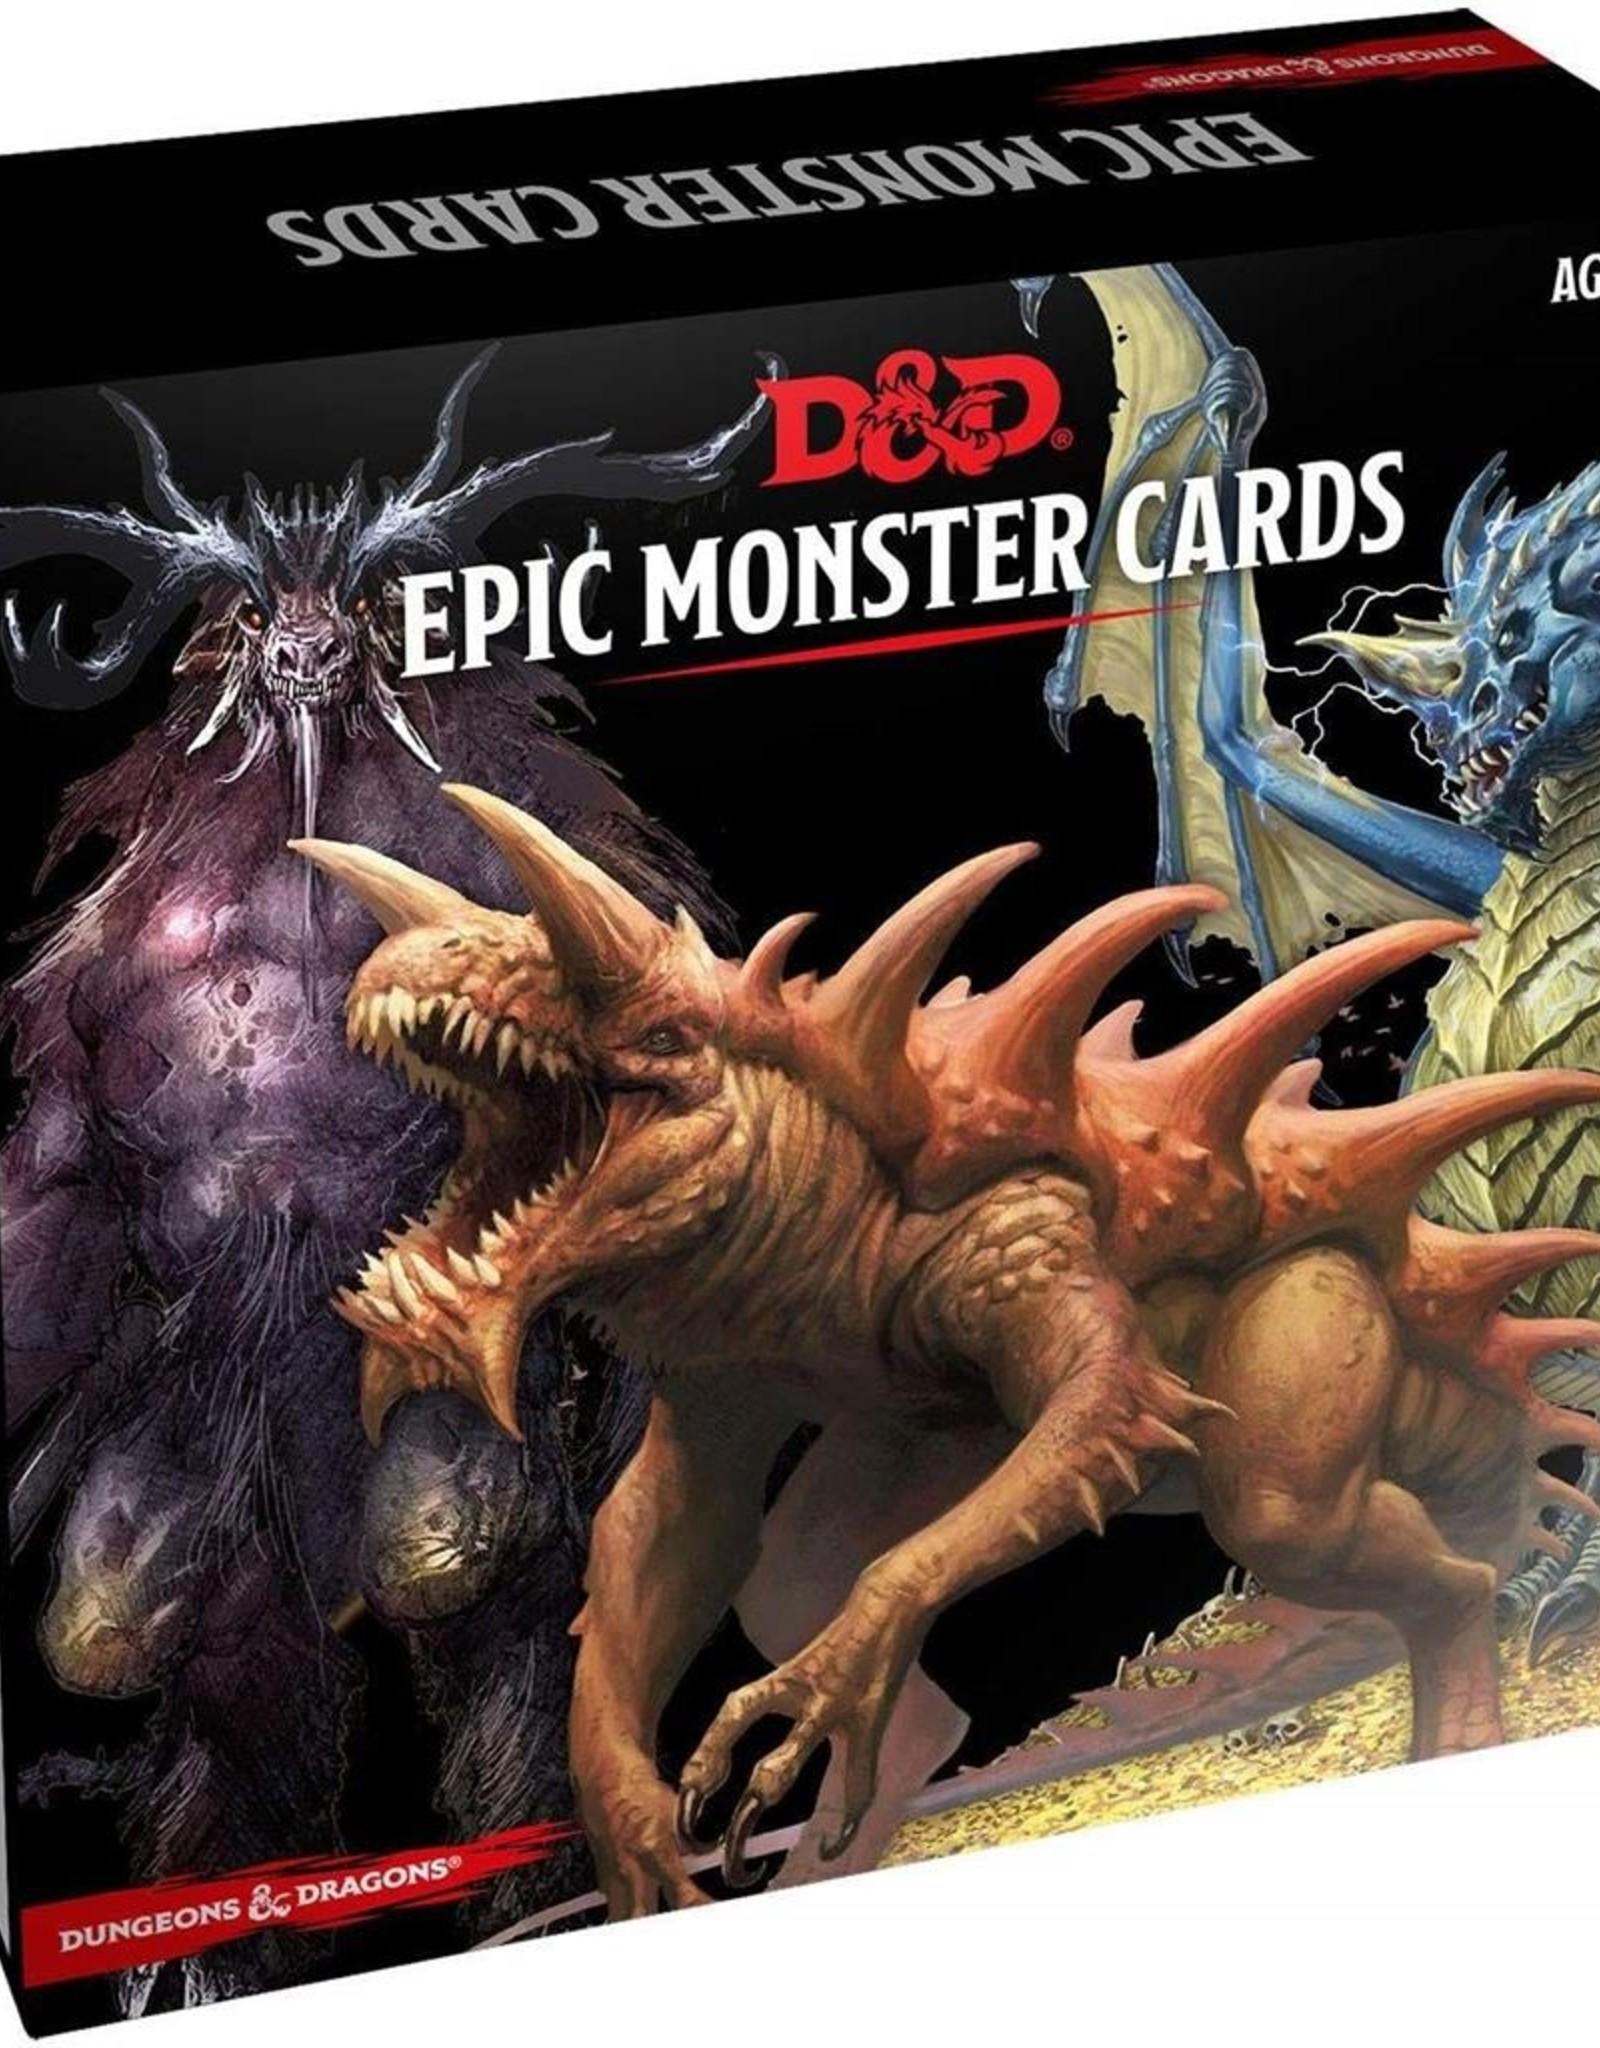 Gale Force Nine D&D 5th ed. Spellbook Cards Epic Monsters